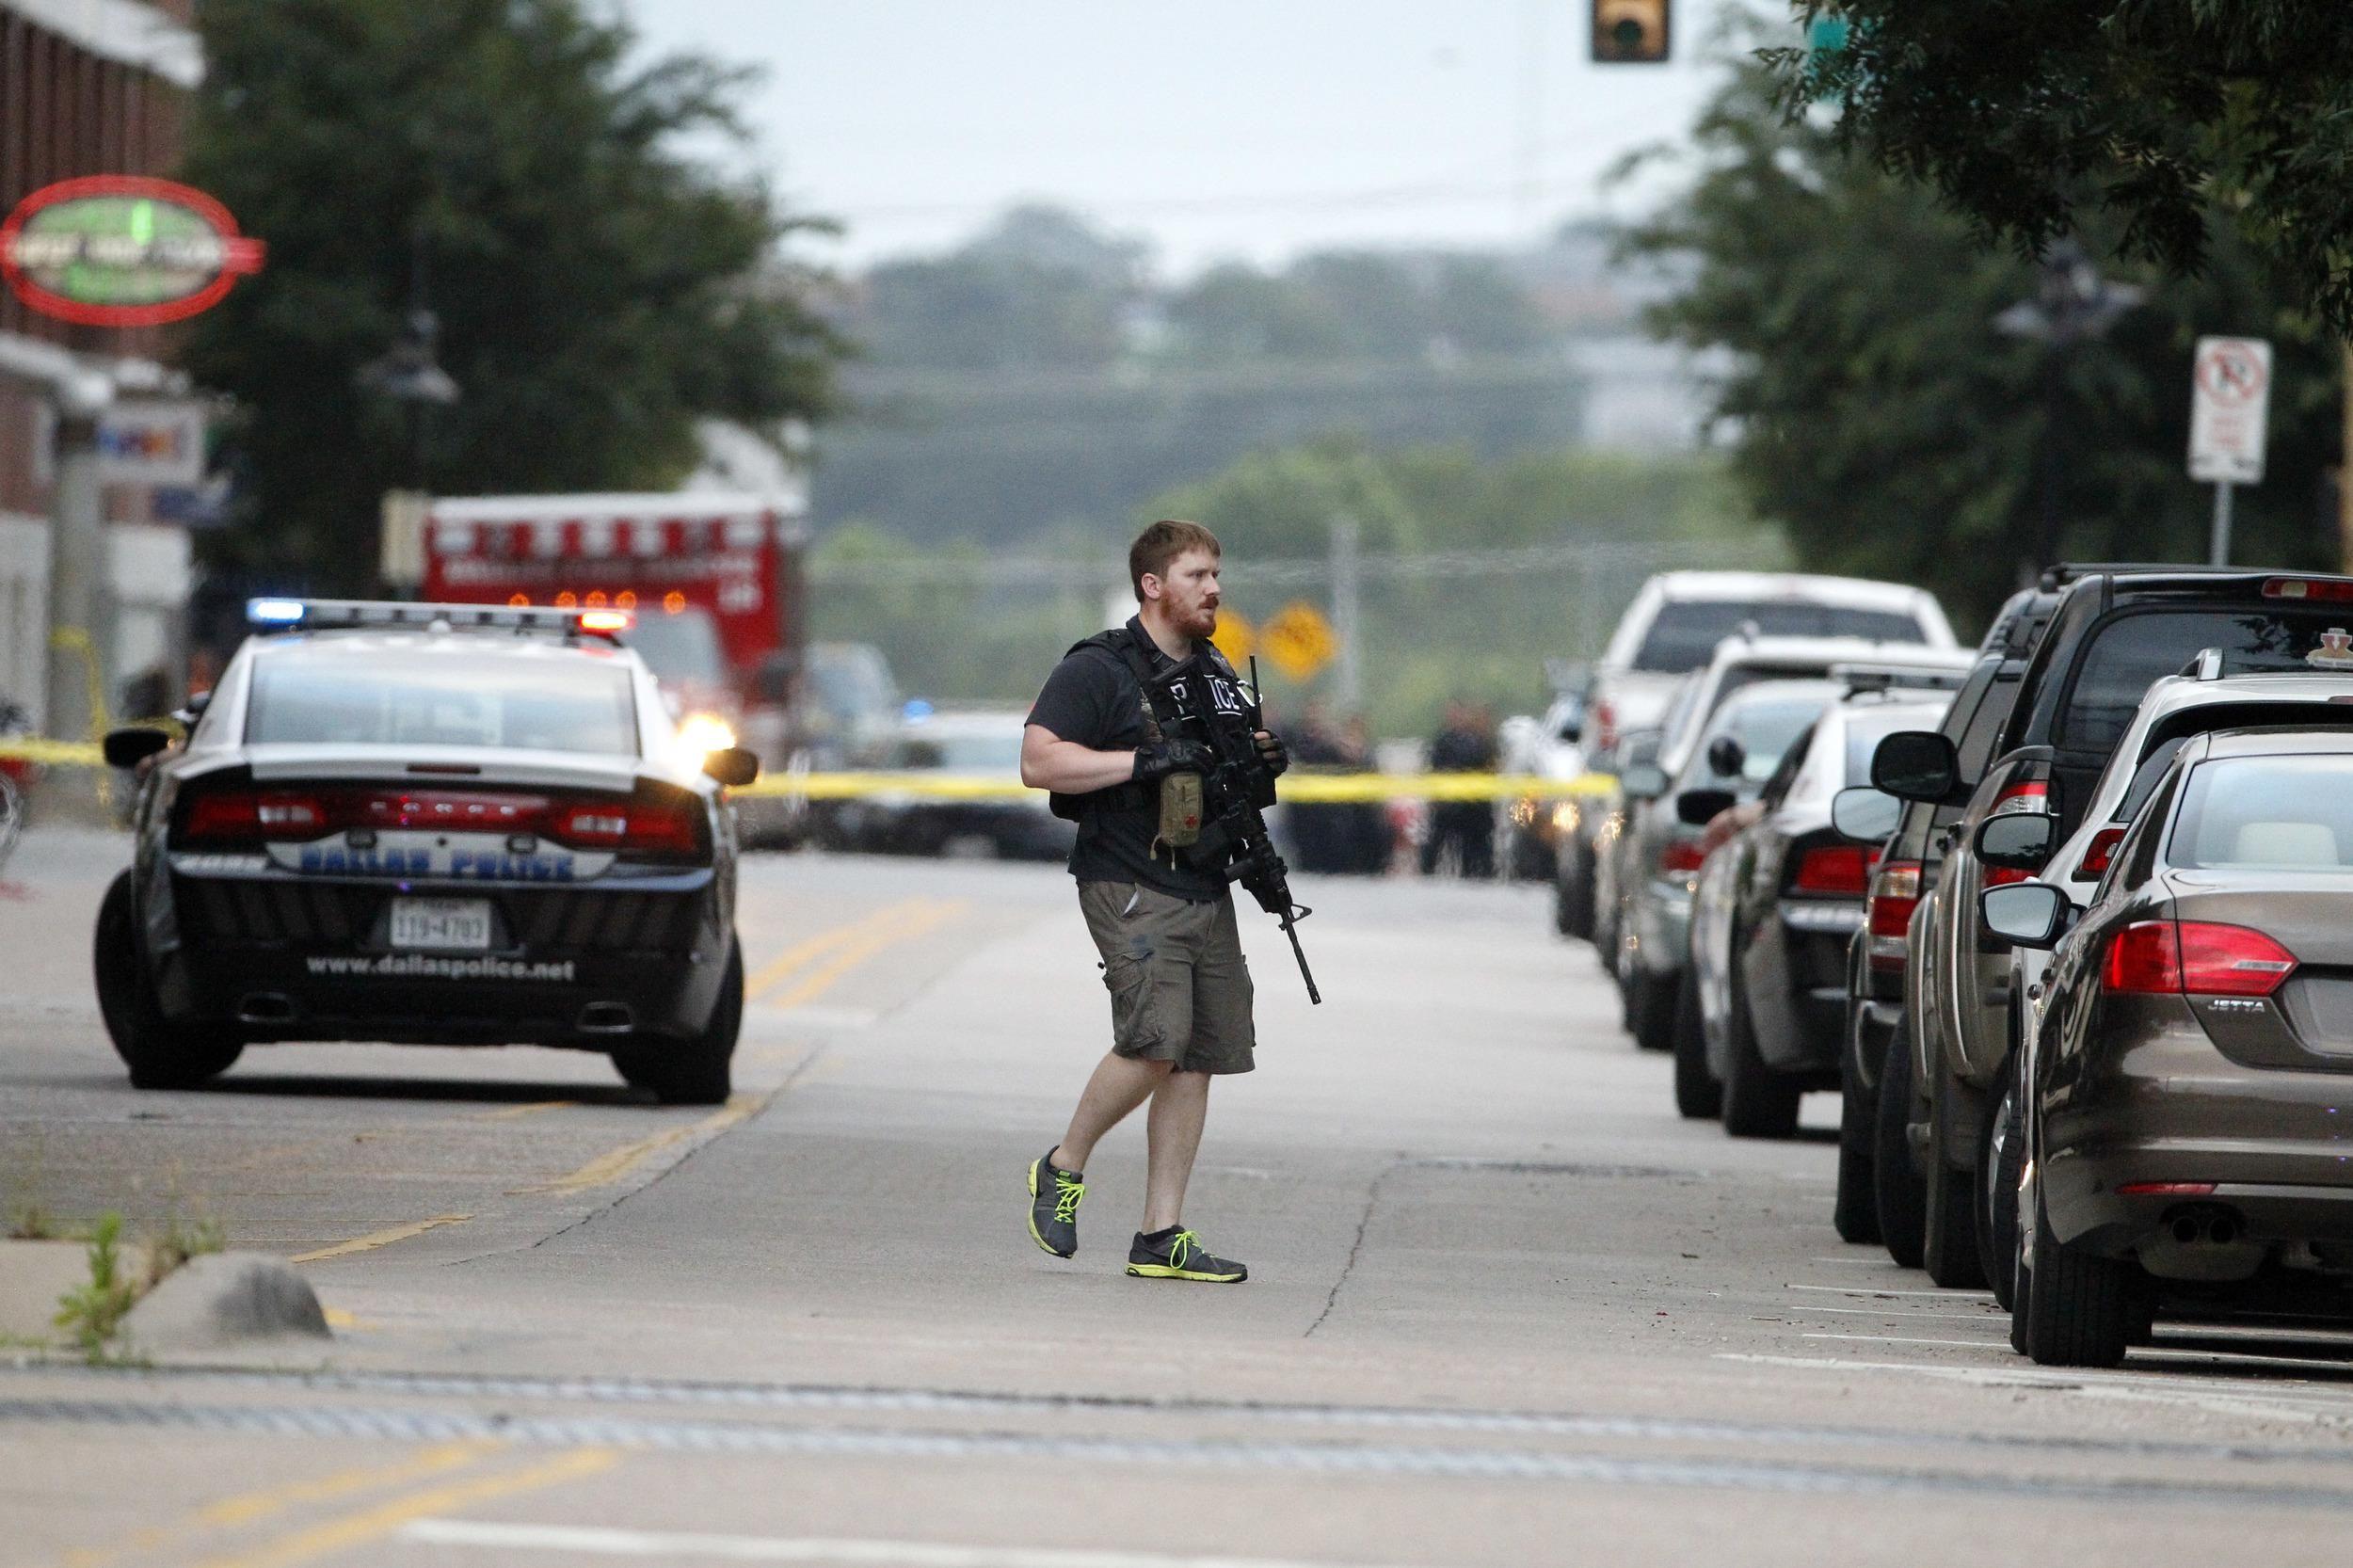 Police: Suspect dead after attack on Dallas police building